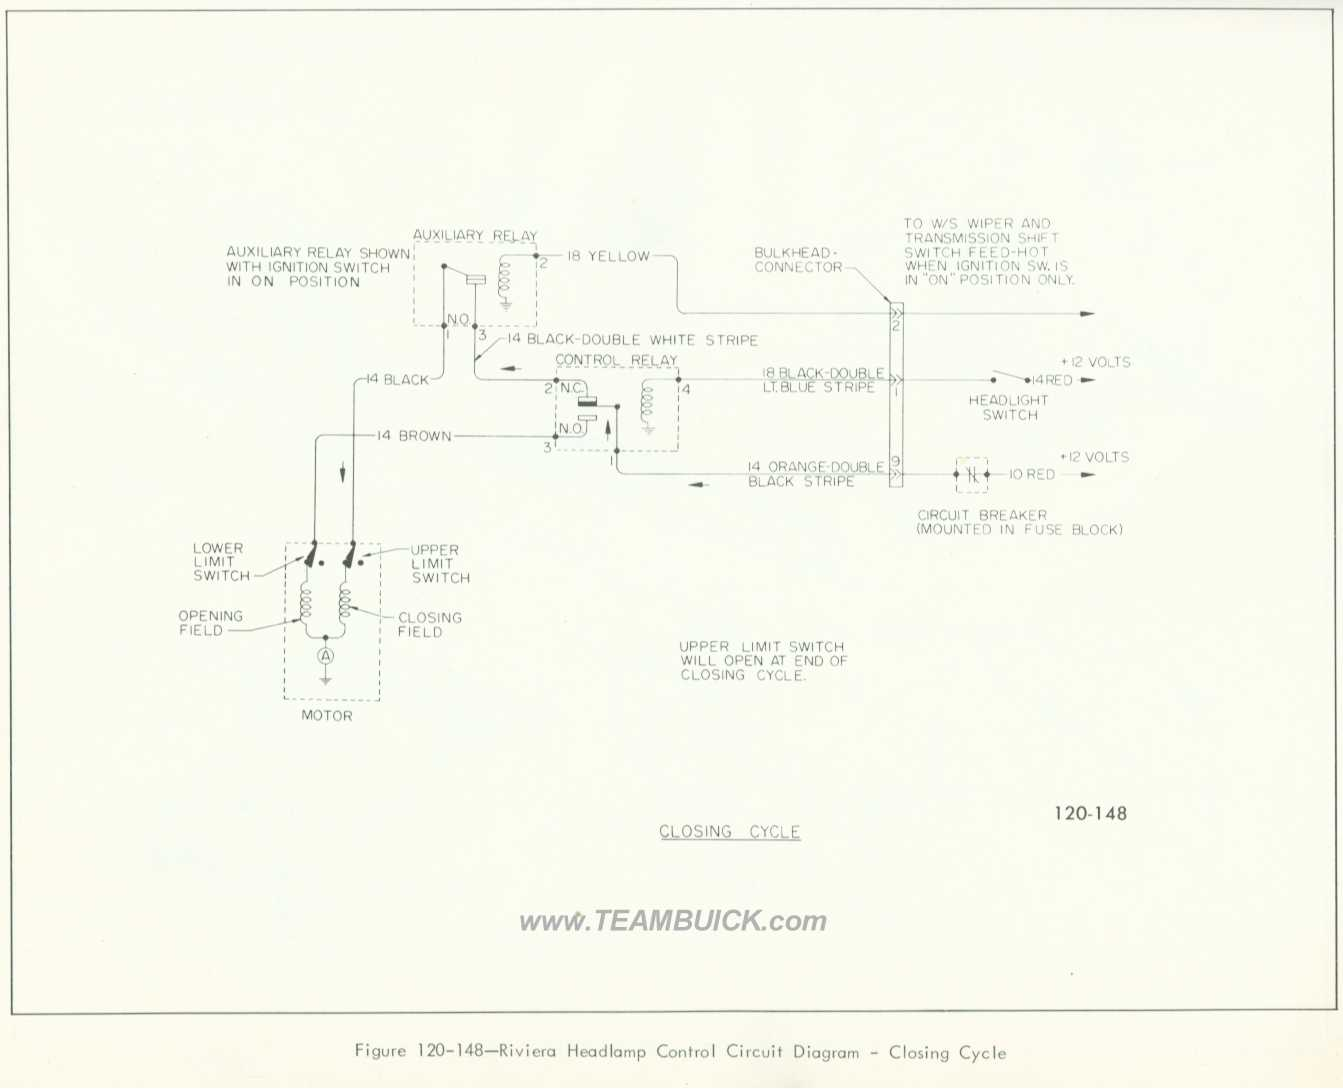 Buick Riviera Headlamp Control Circuit Diagram